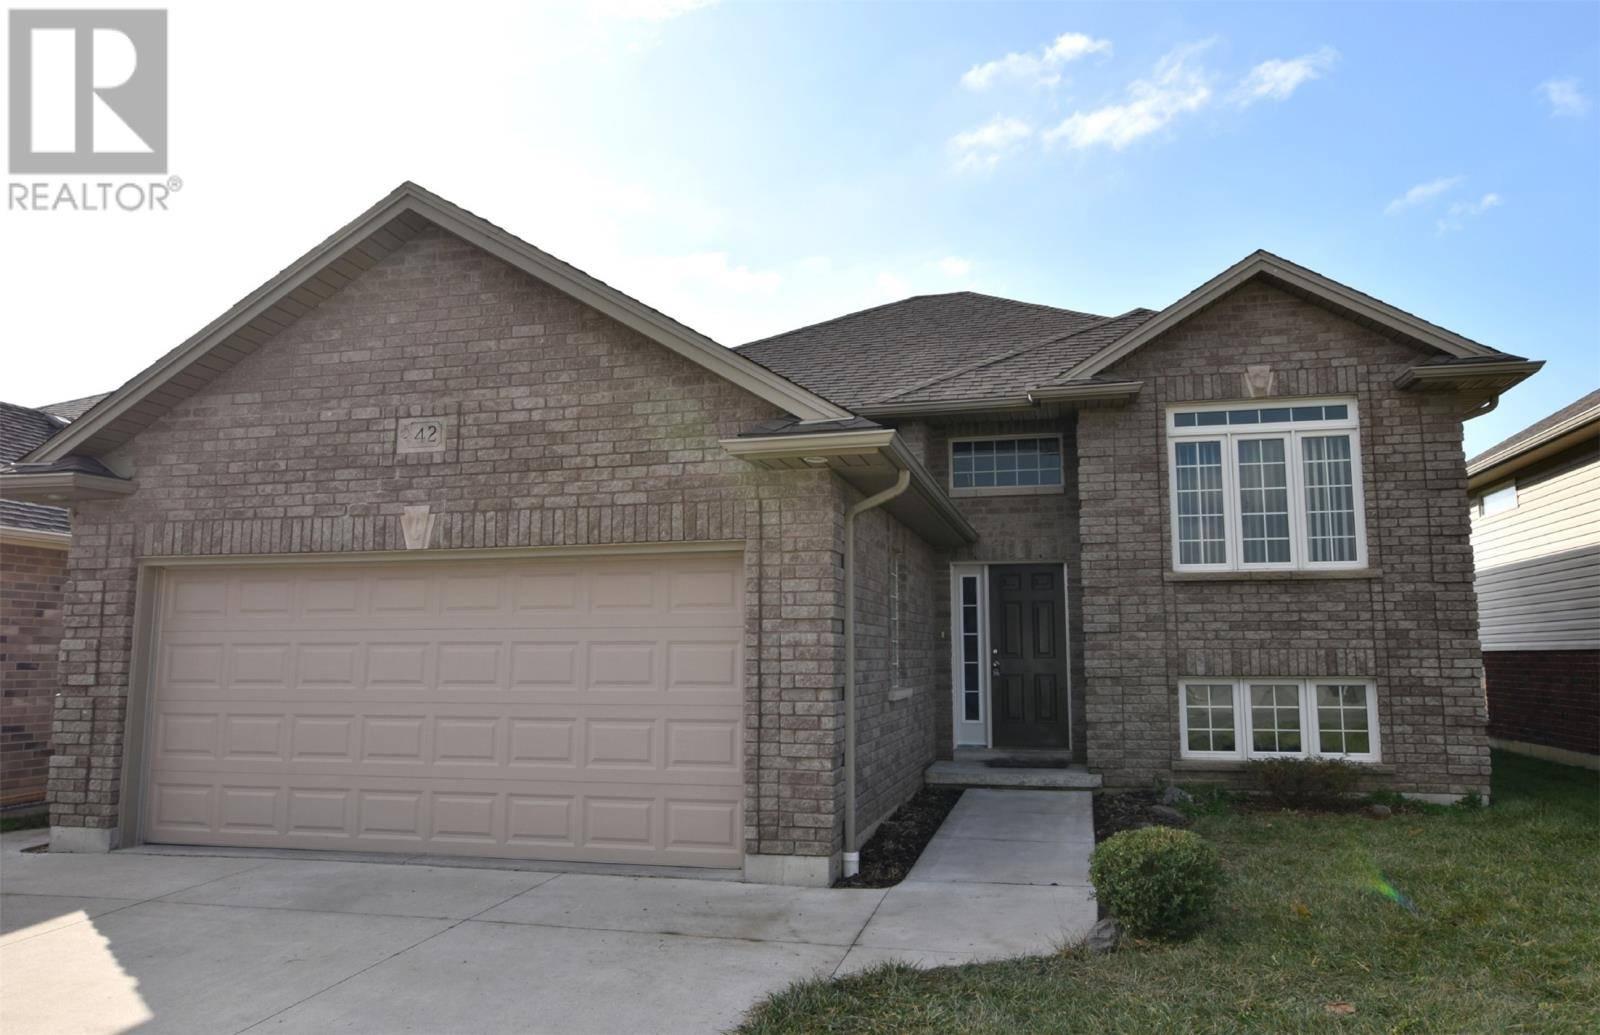 House for sale at 42 Molengraaf Way  Chatham Ontario - MLS: 20000140